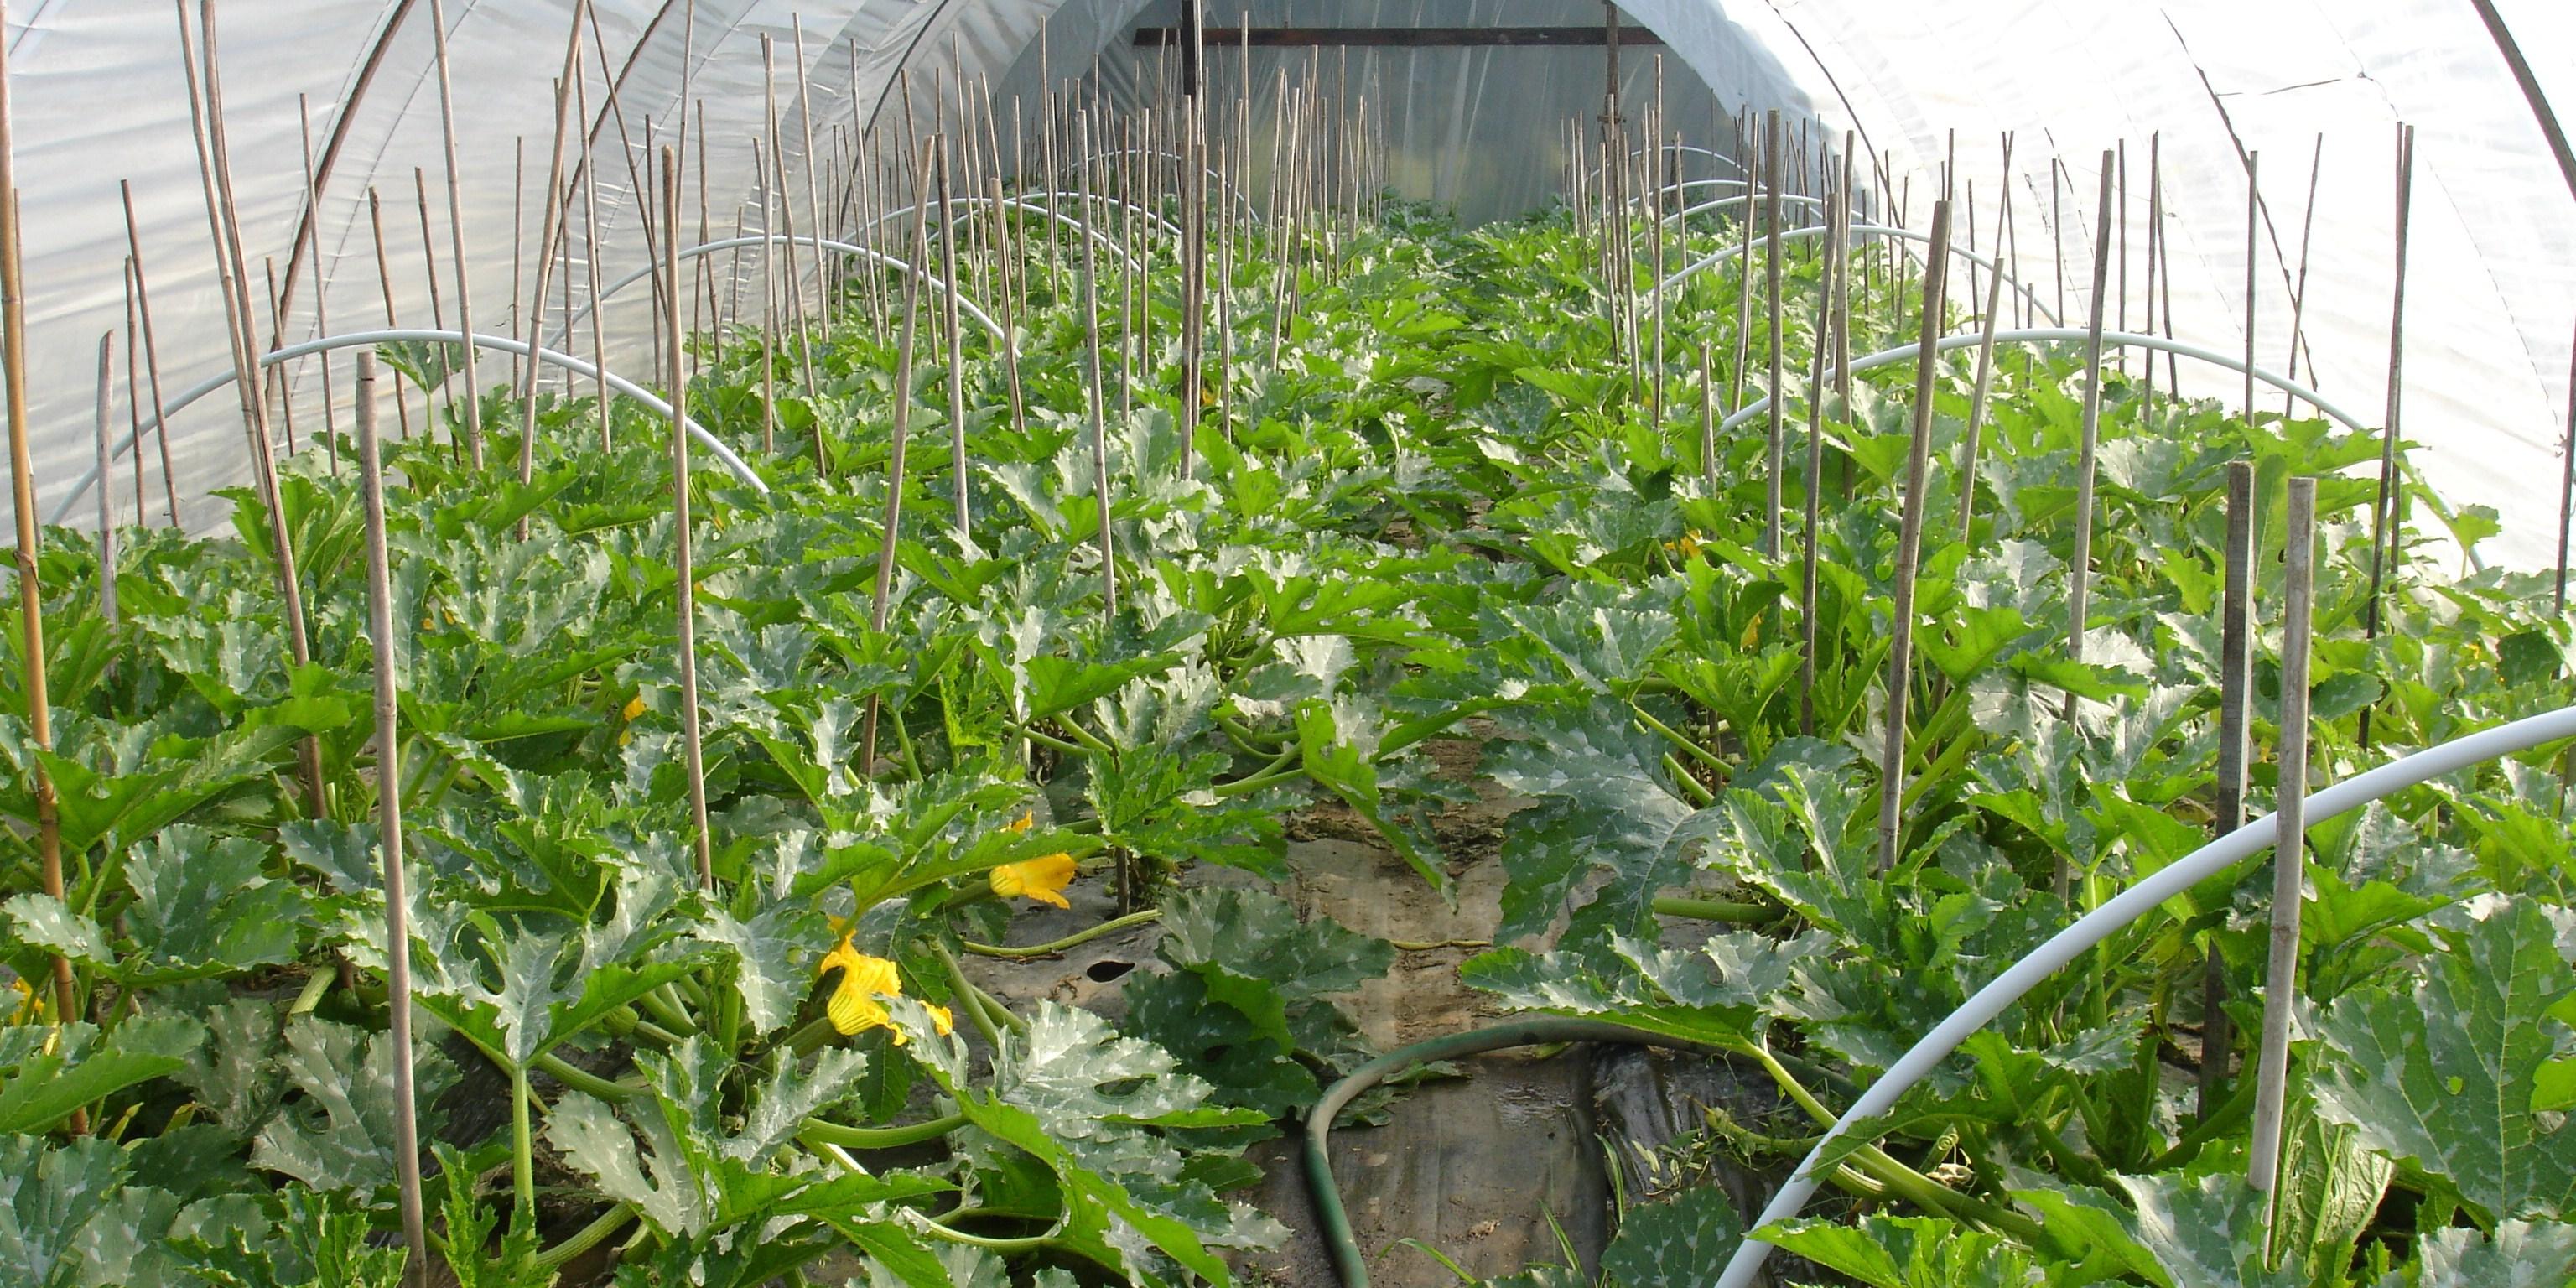 подкормка кабачков во время цветения и плодоношения